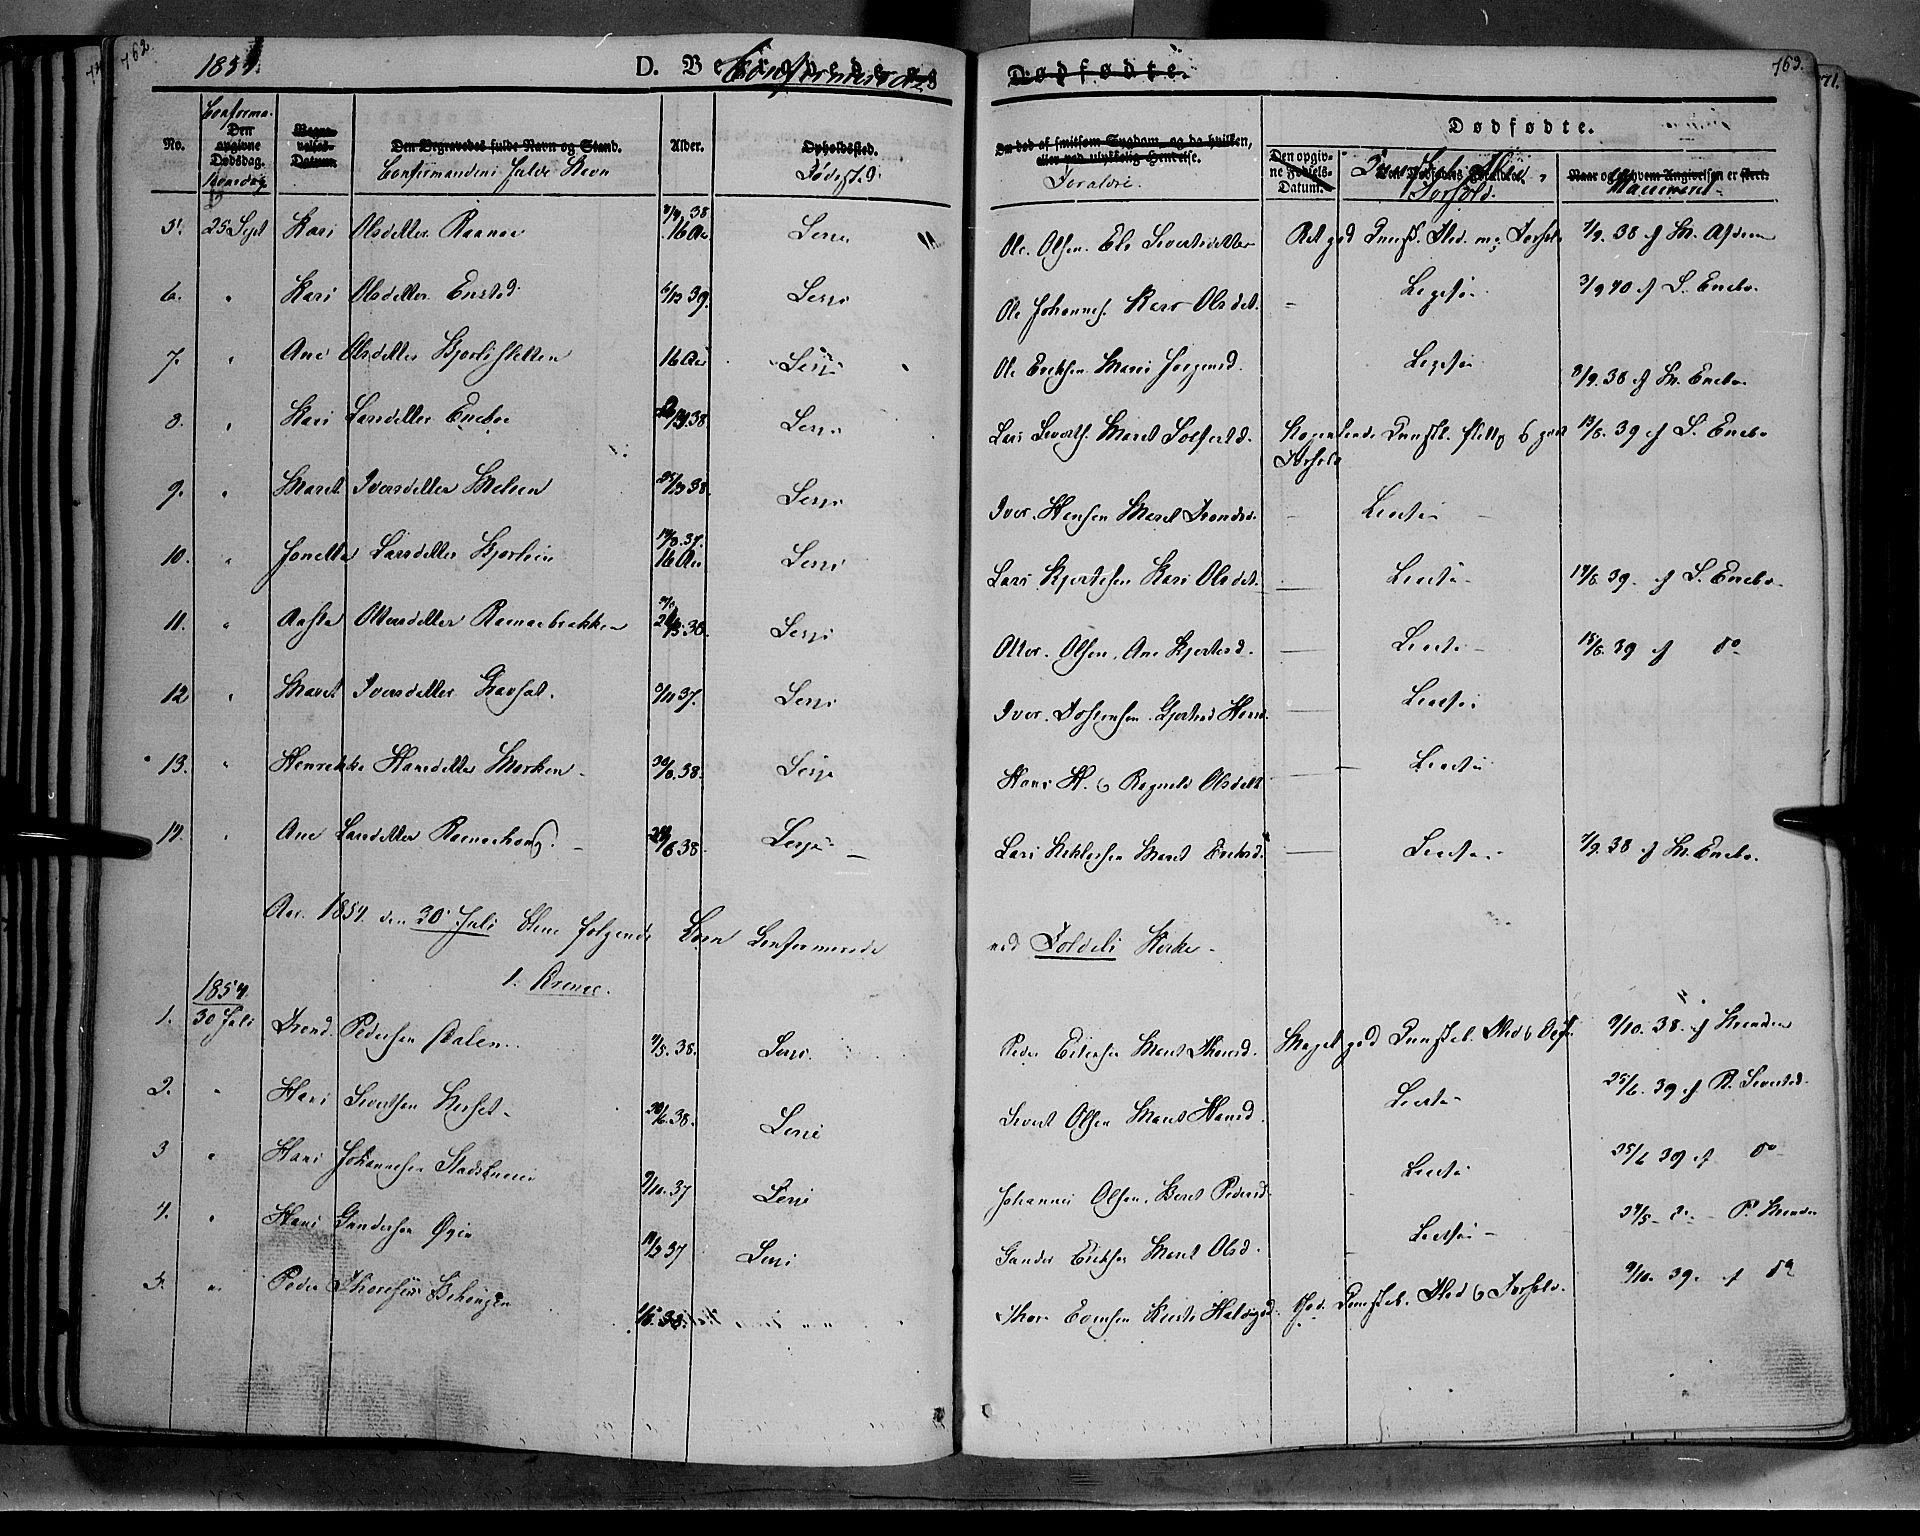 SAH, Lesja prestekontor, Ministerialbok nr. 6B, 1843-1854, s. 762-763